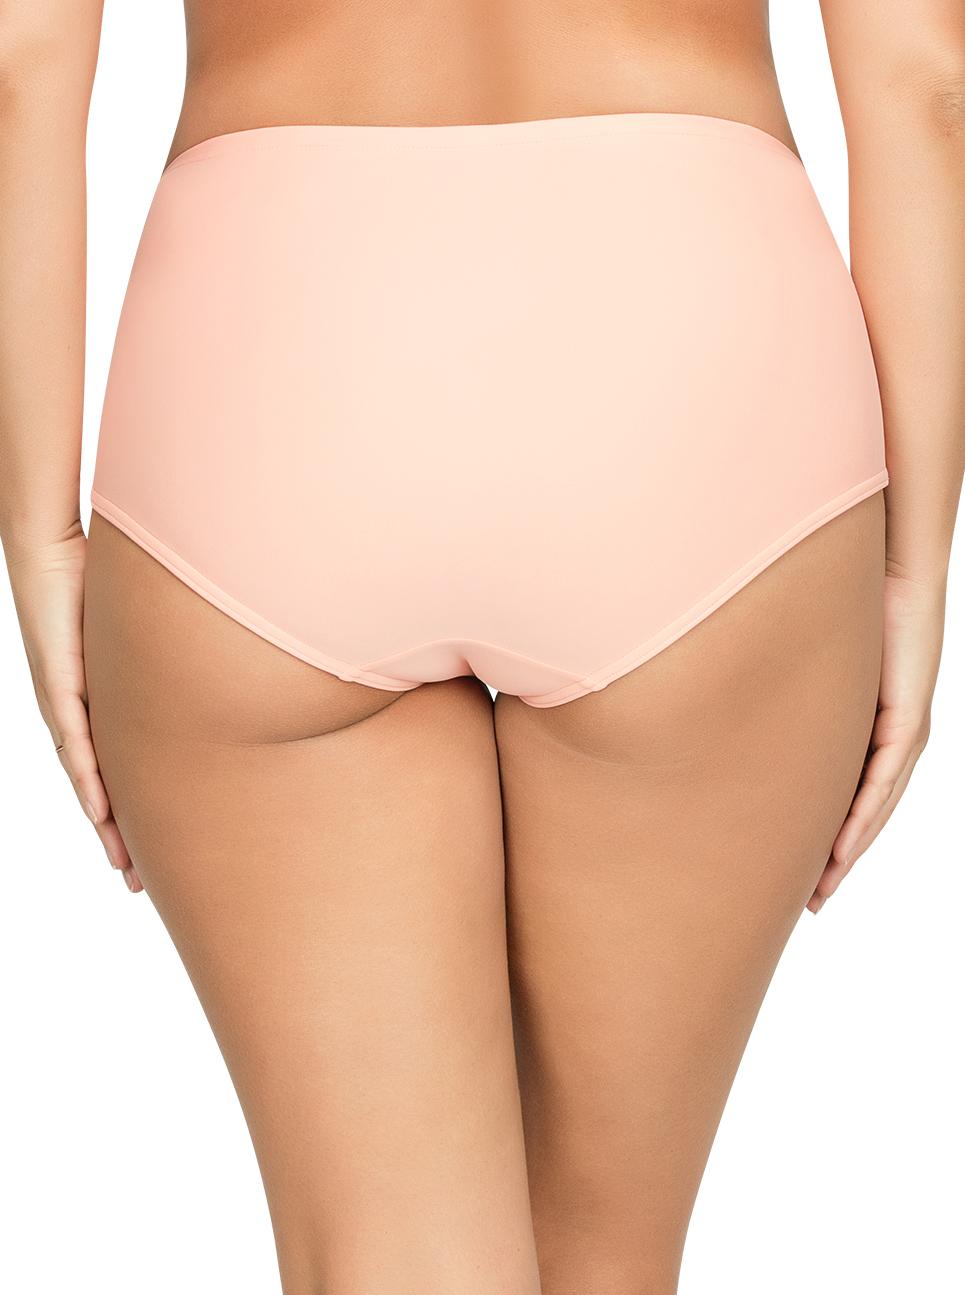 PARFAIT Keira HighWaistBikiniBottomS8075 Peach Back - Keira High-Waist Bikini Bottom Peach S8075